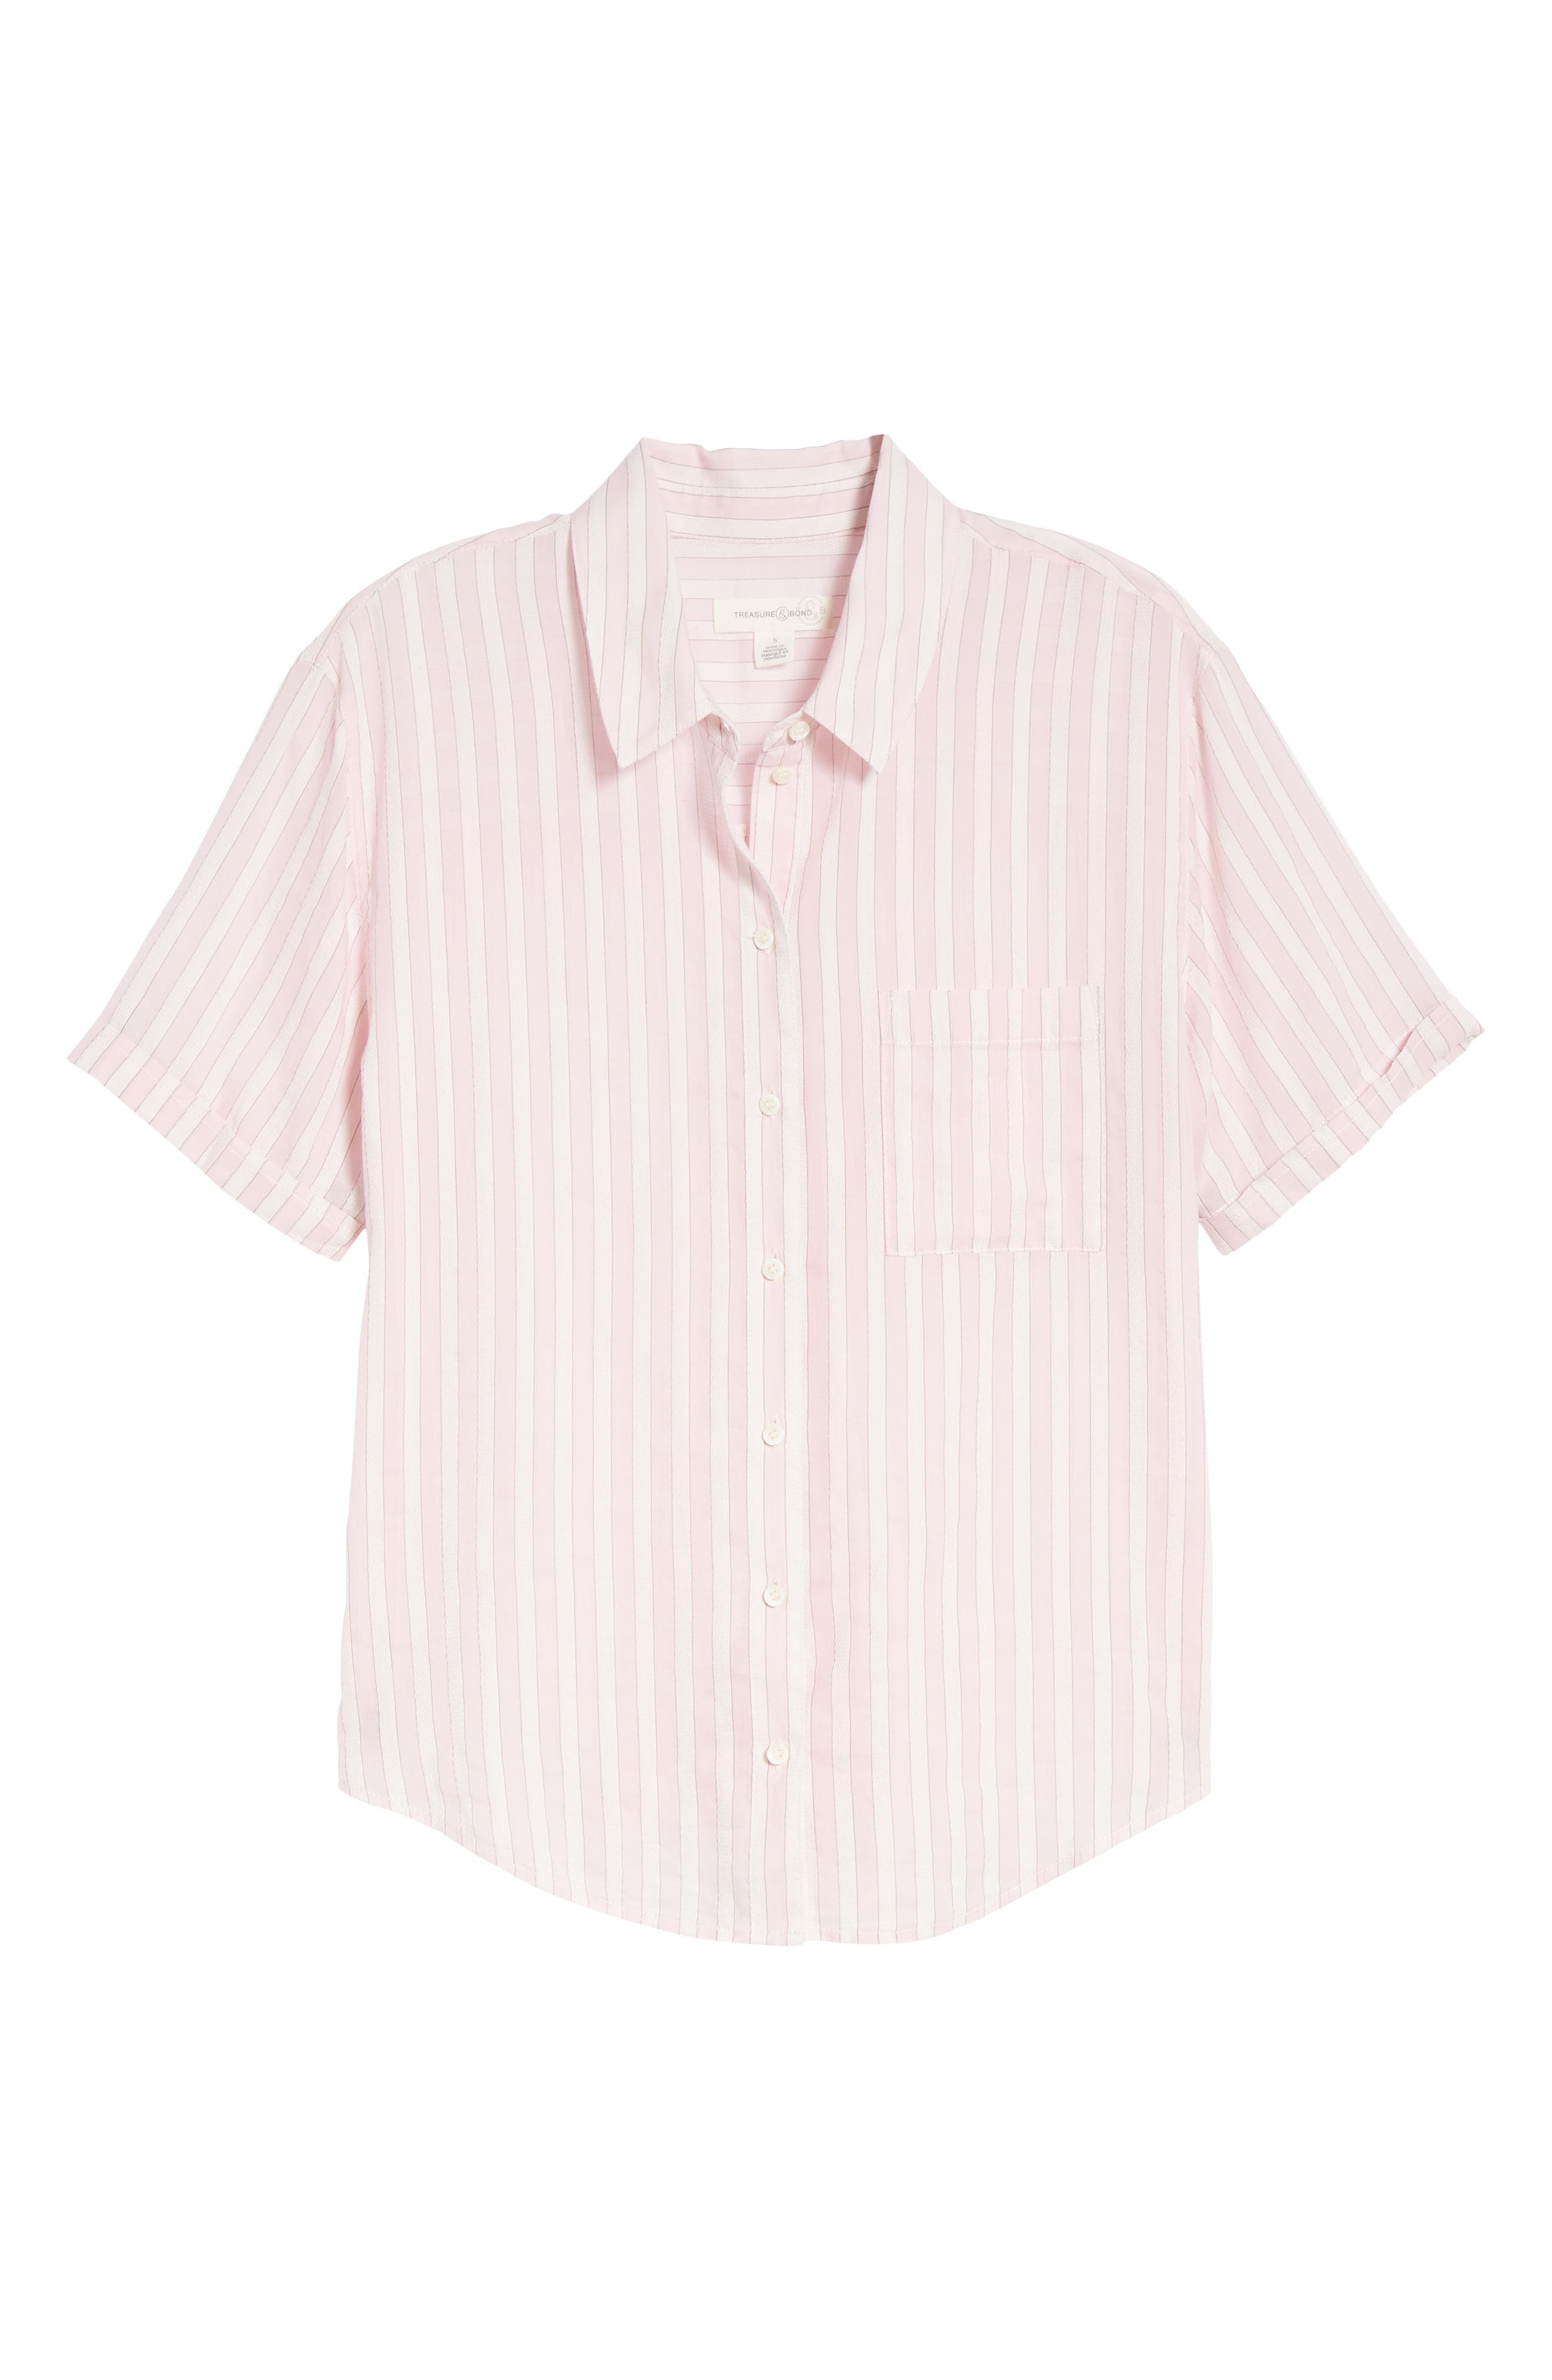 Stripe Shirt,                             Alternate thumbnail 7, color,                             PINK OPAL TAILOR STRIPE